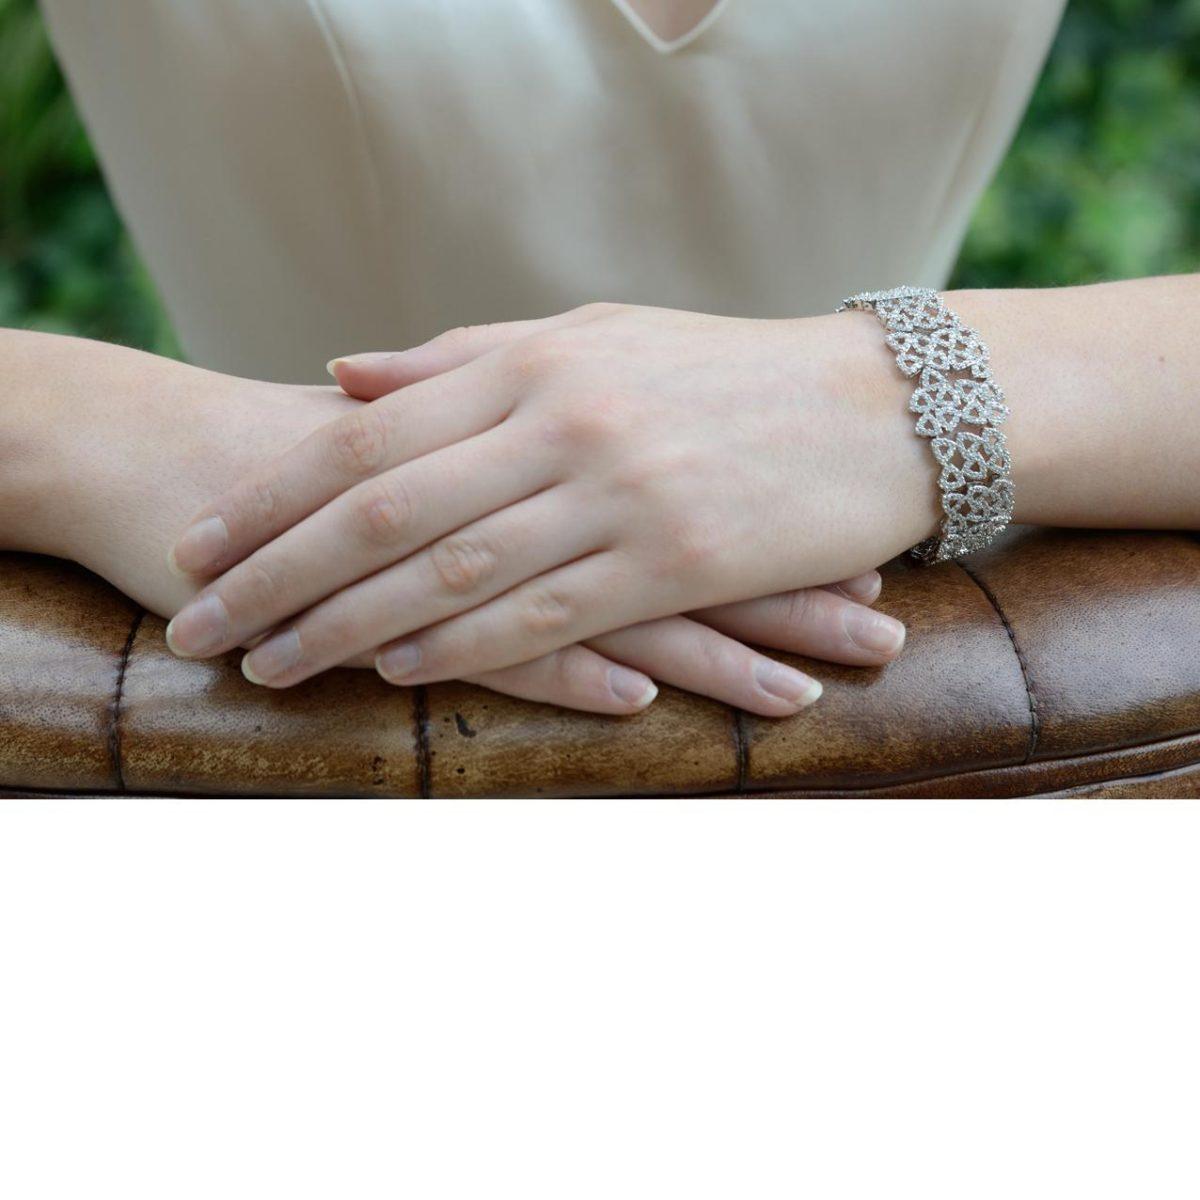 Ivory and Co St. Moritz Bracelet